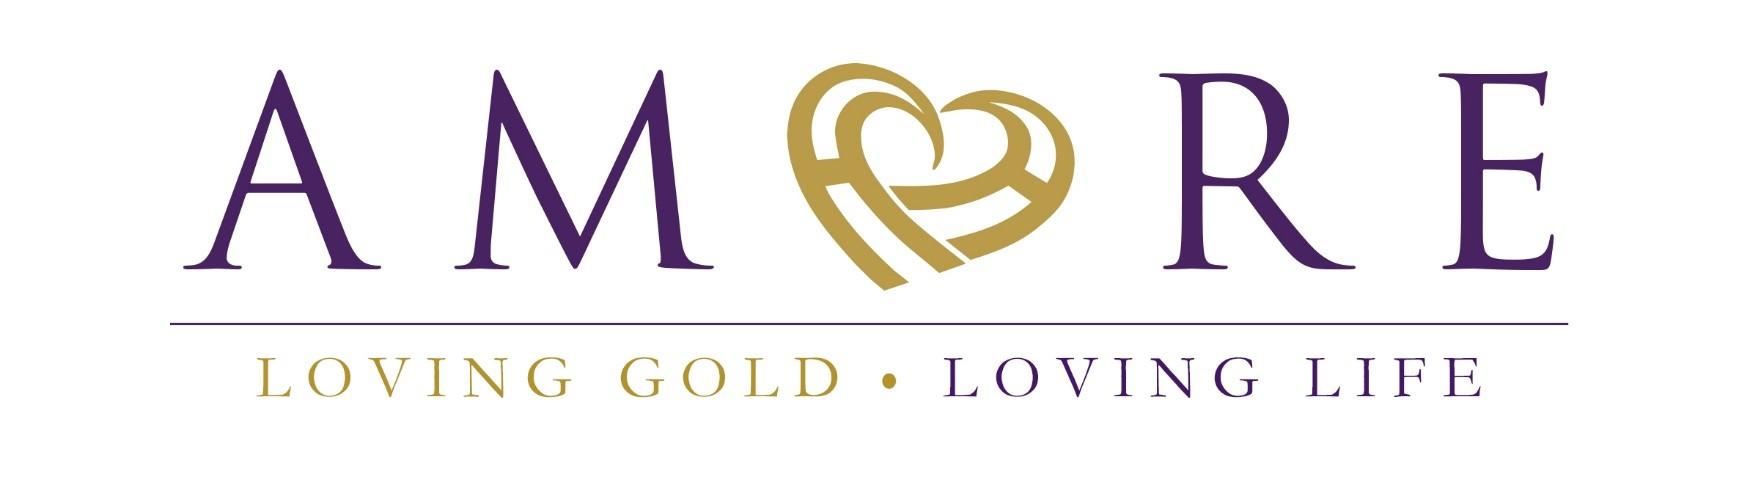 "Amore Jewellery – ""Amore Loving Life"" – THJ Newsletter"